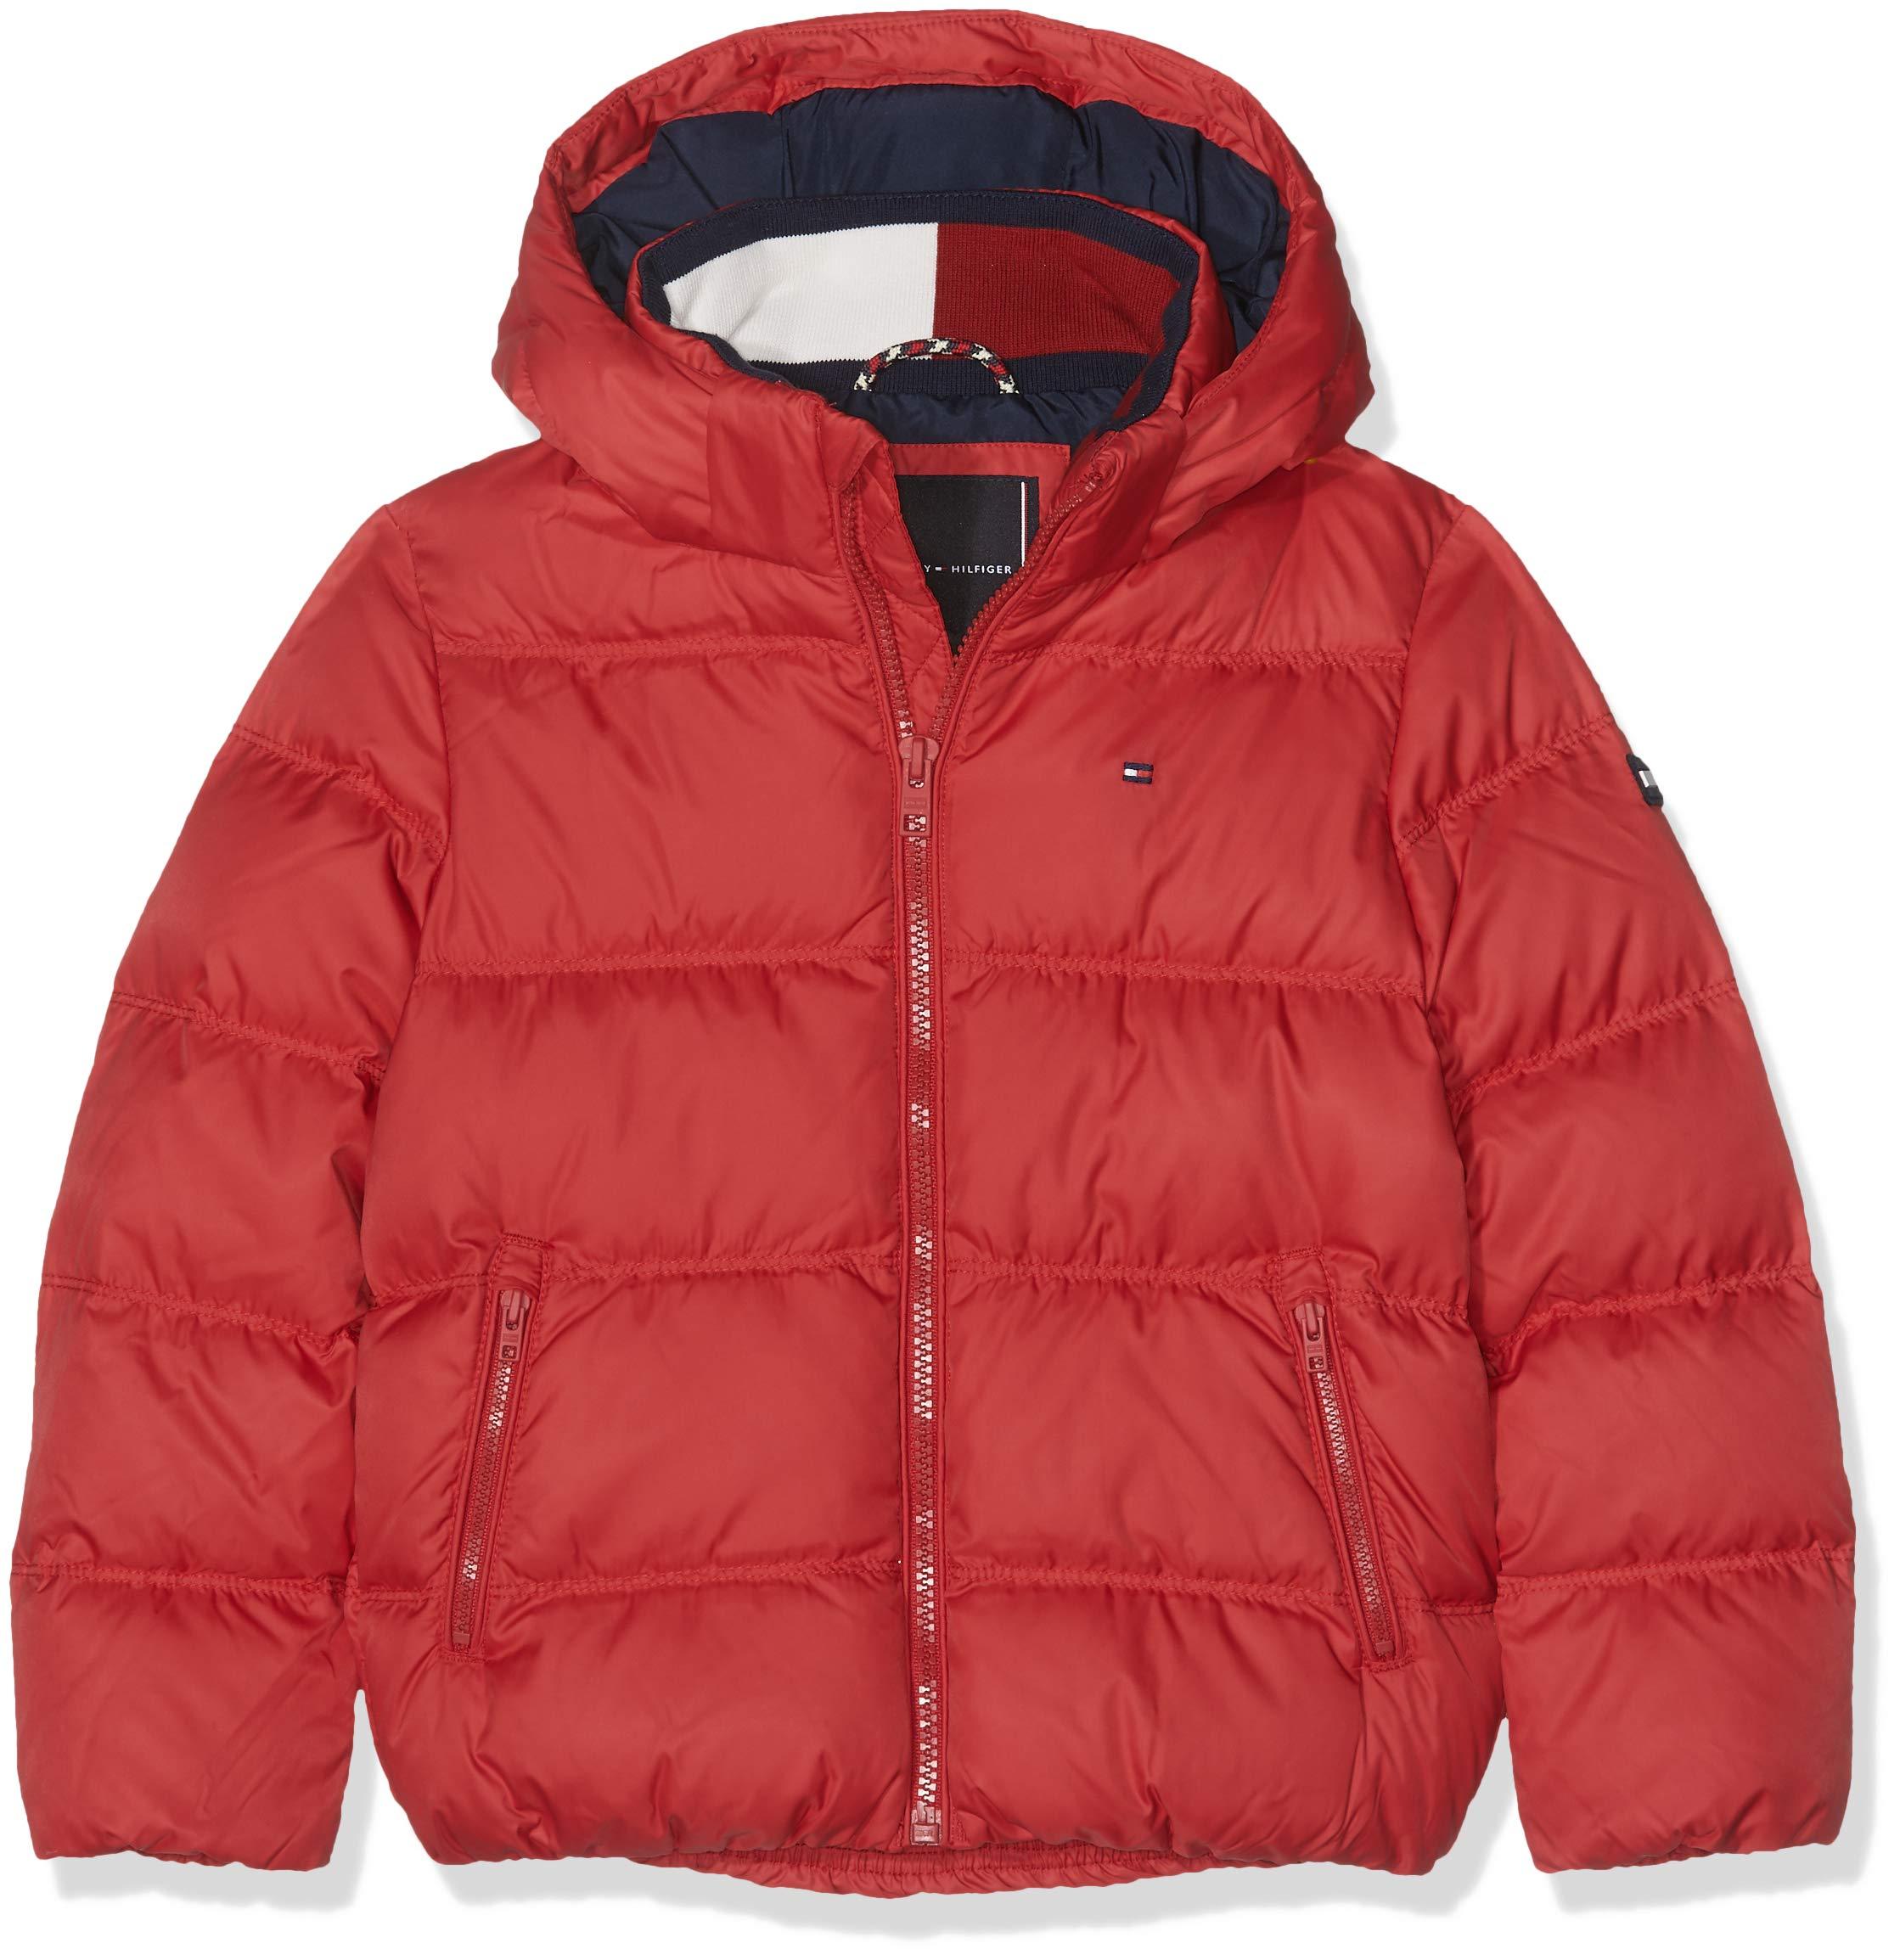 Tommy Hilfiger Essential Basic Down Jacket Chaqueta para Niños